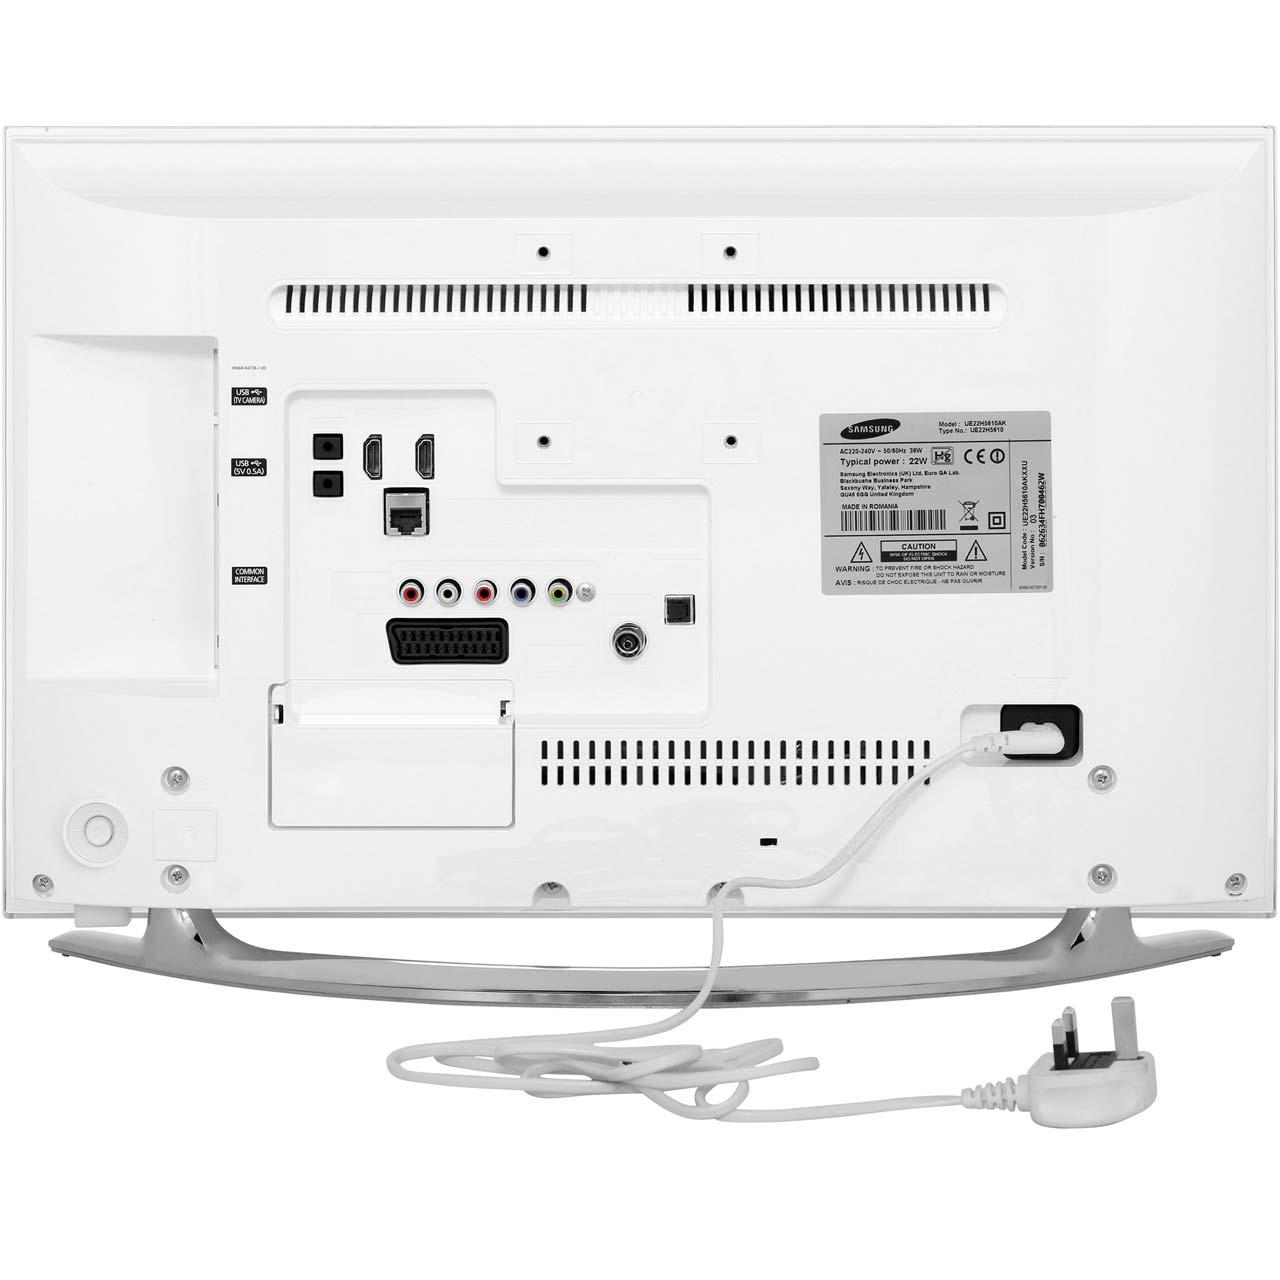 Samsung UE22H5610 22 Inch Smart LED TV 1080p Full HD